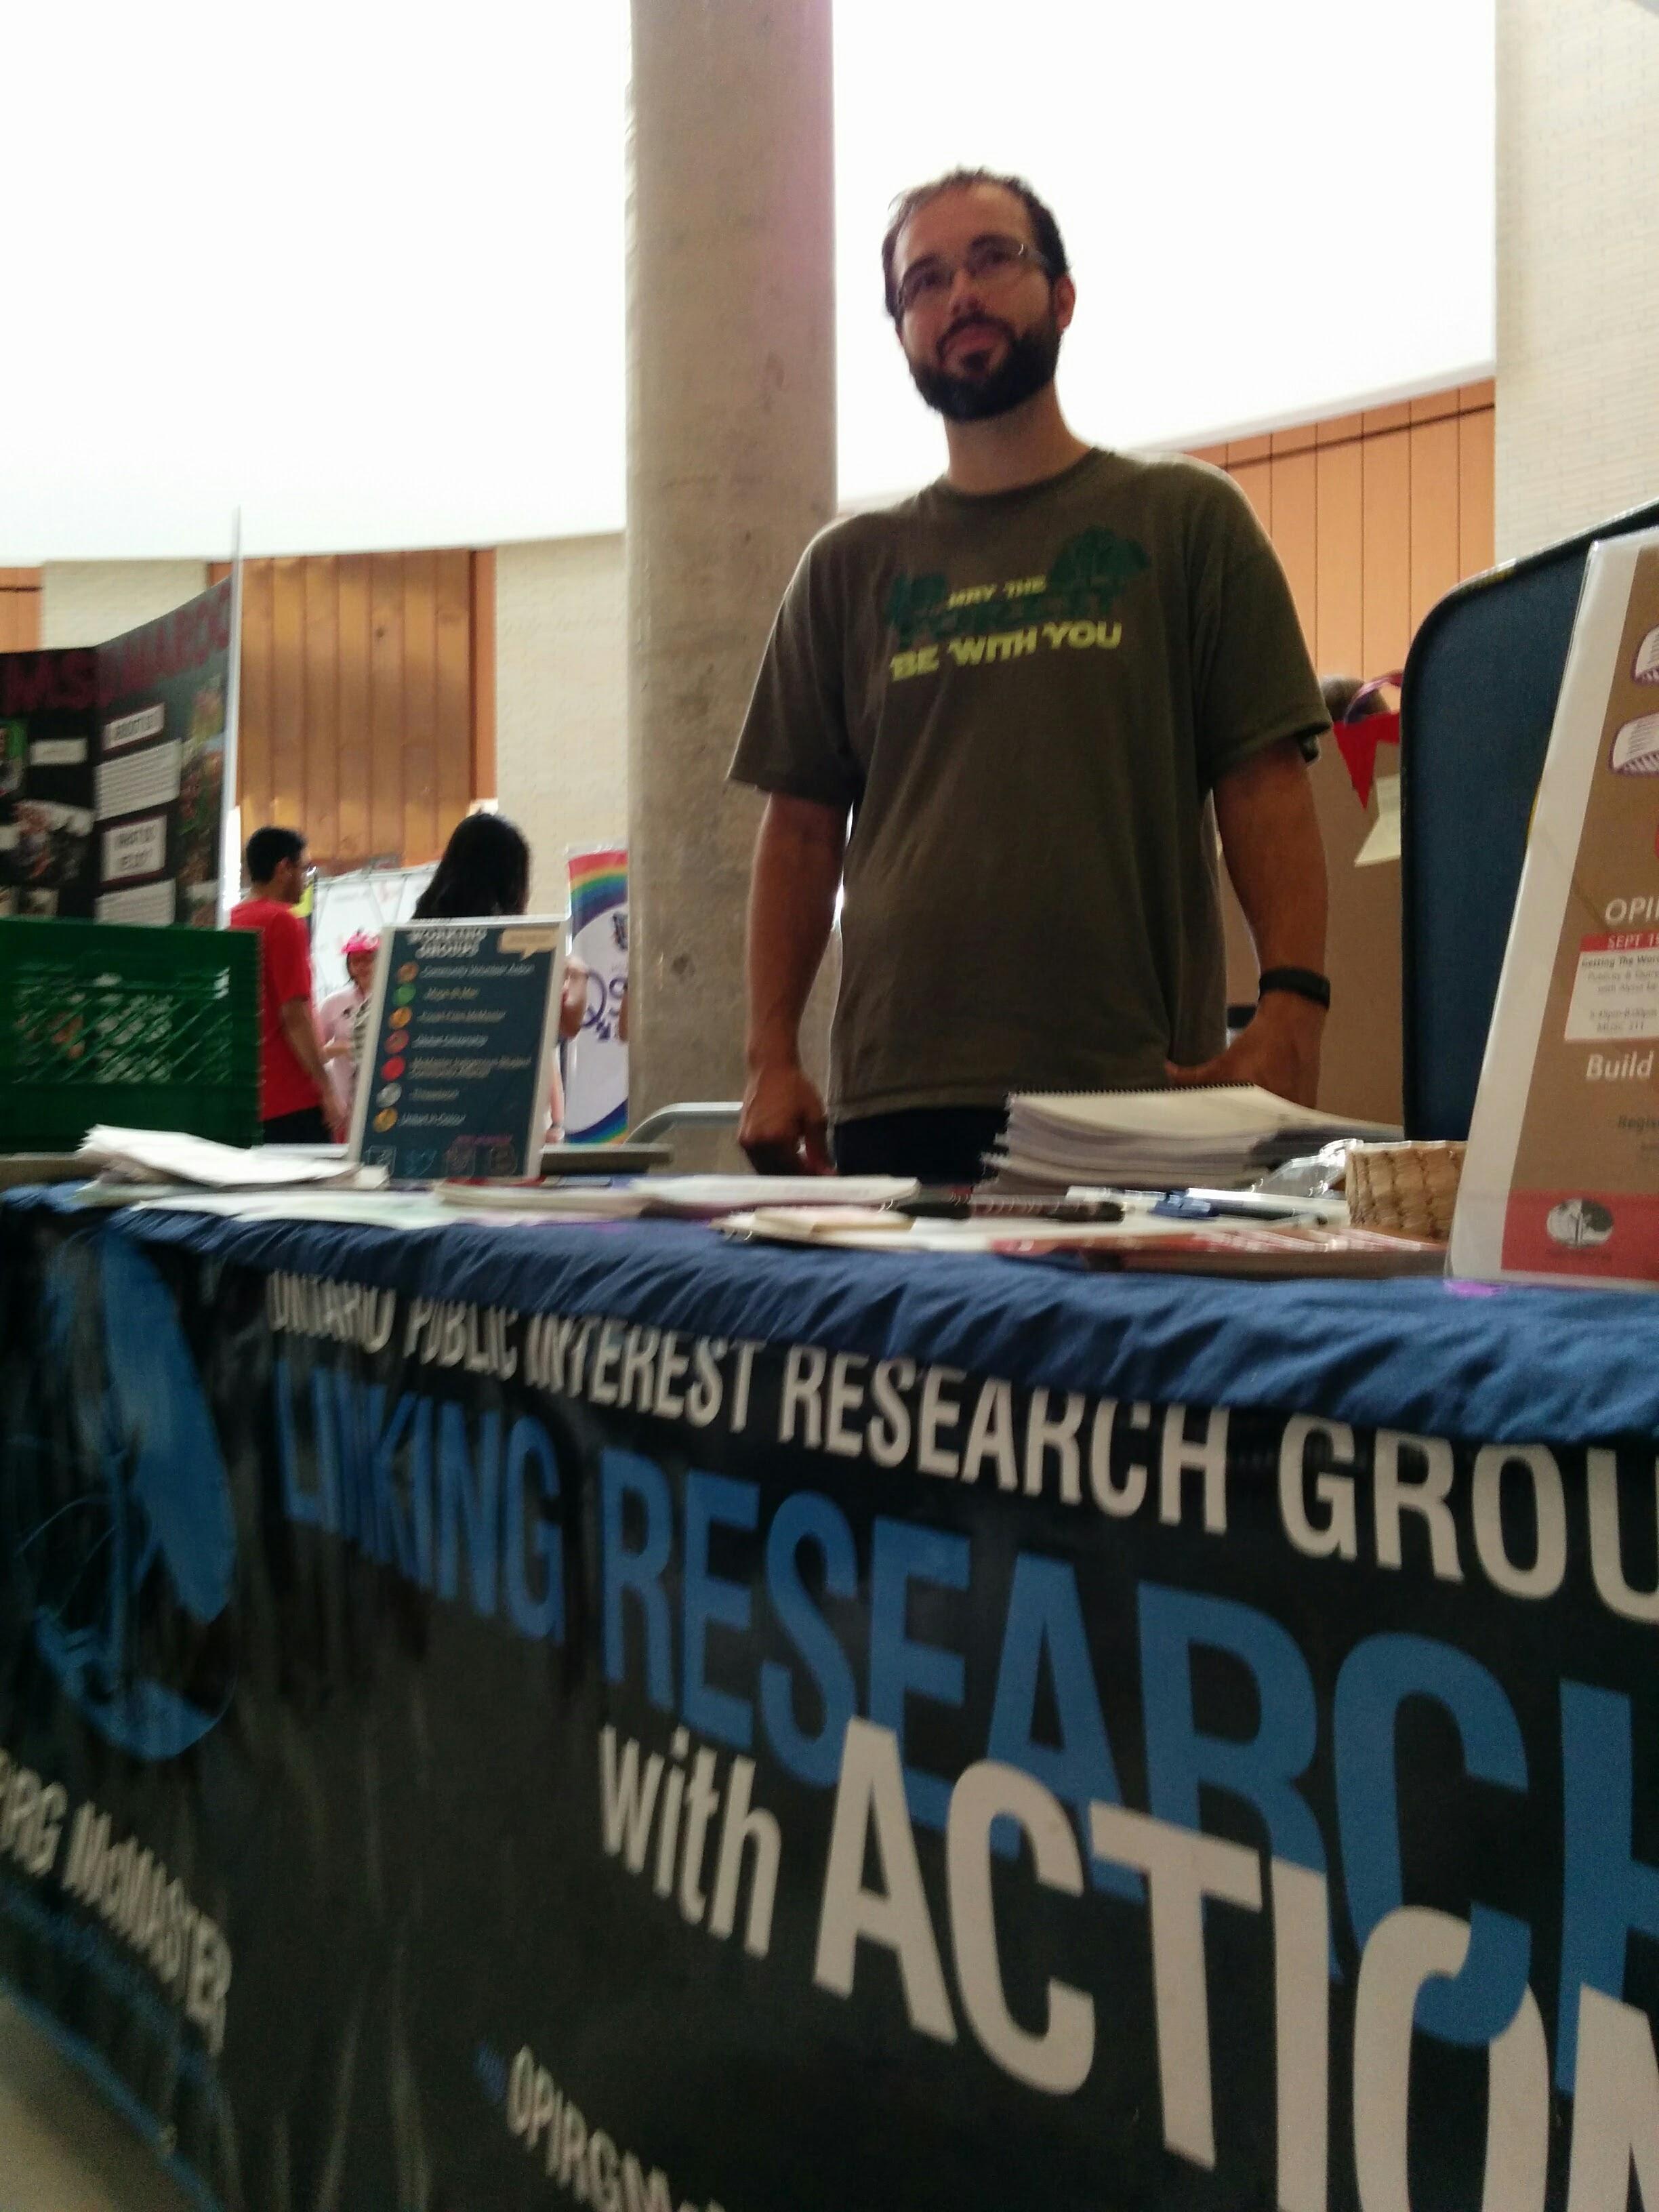 Display table with volunteer